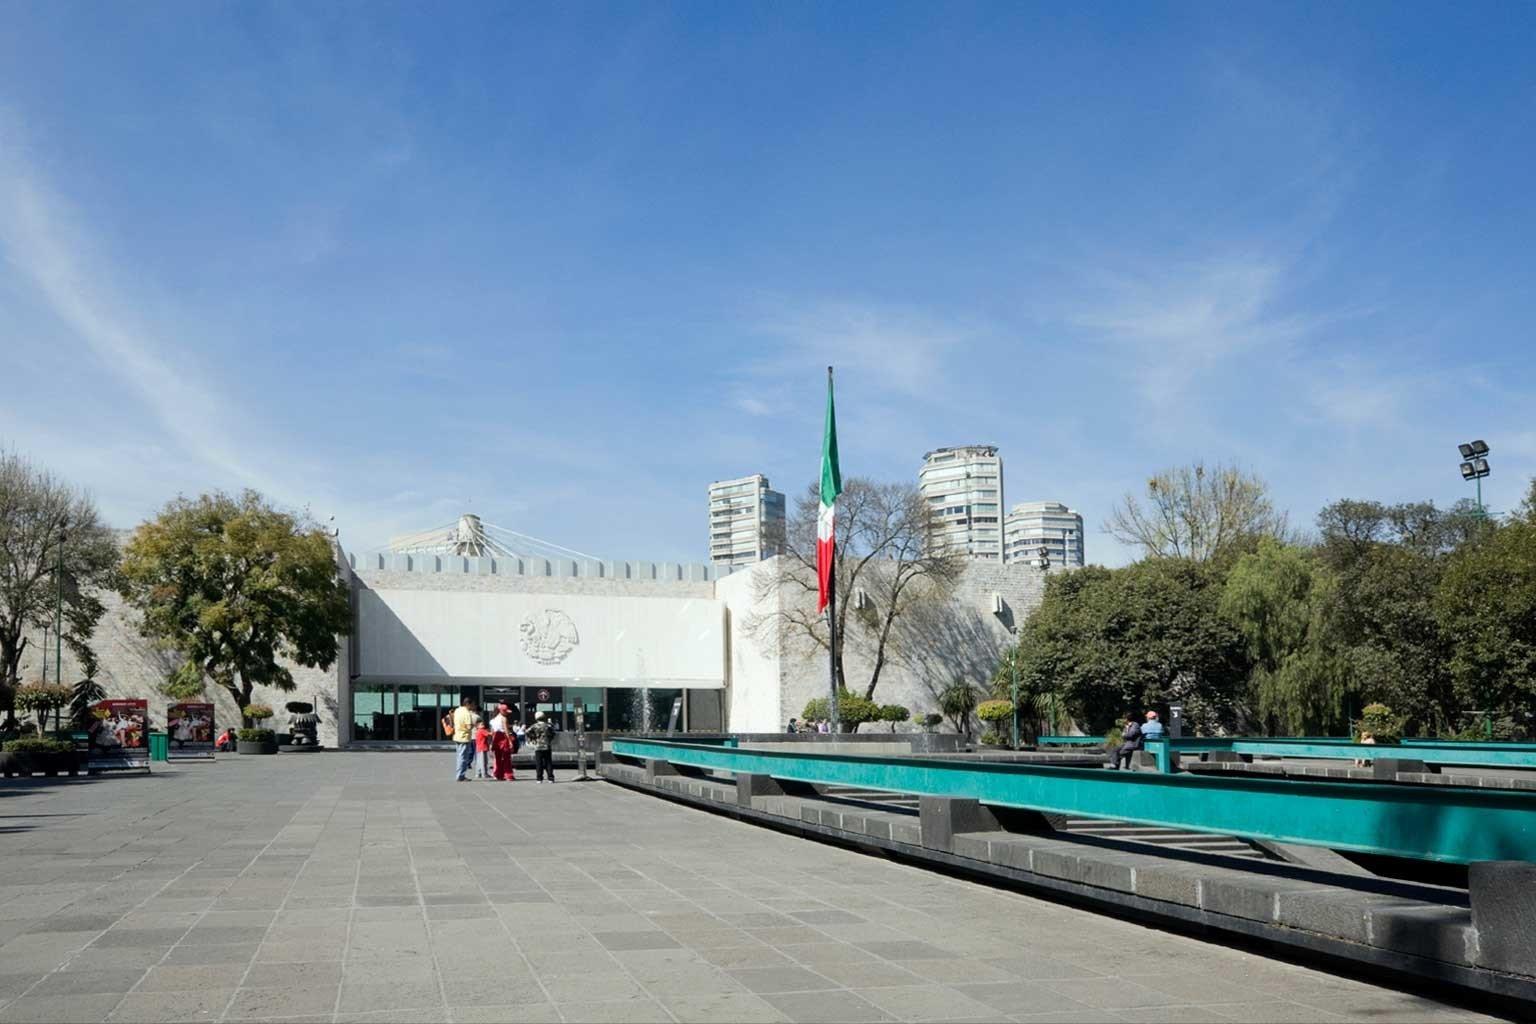 City Cultural Museums sky green walkway vehicle waterway plaza